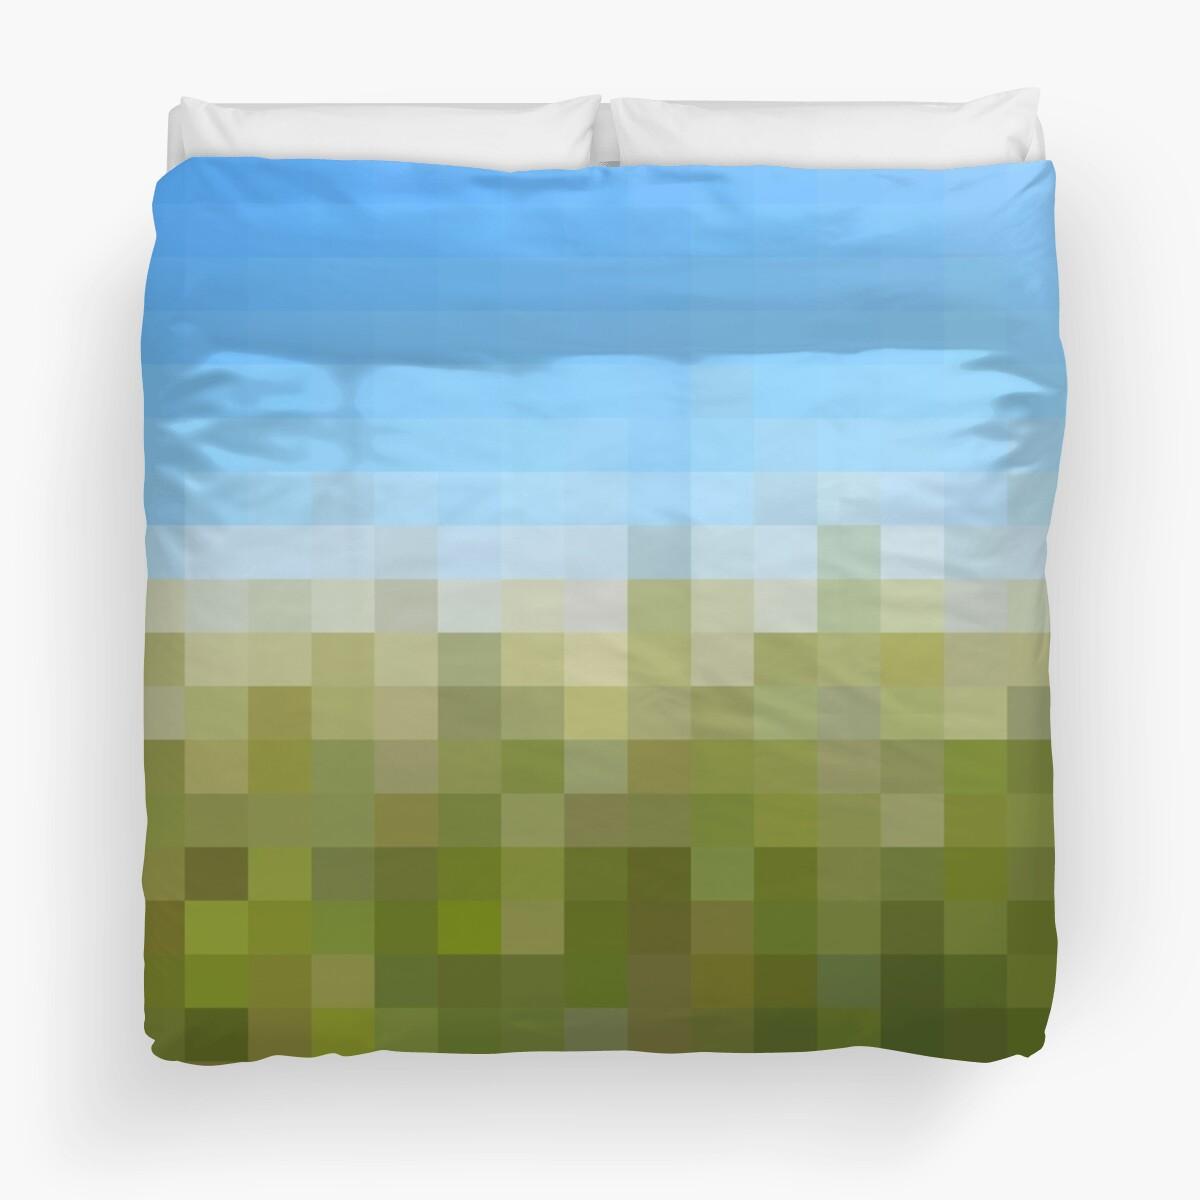 Nature Pixels No 29 by Kitsmumma